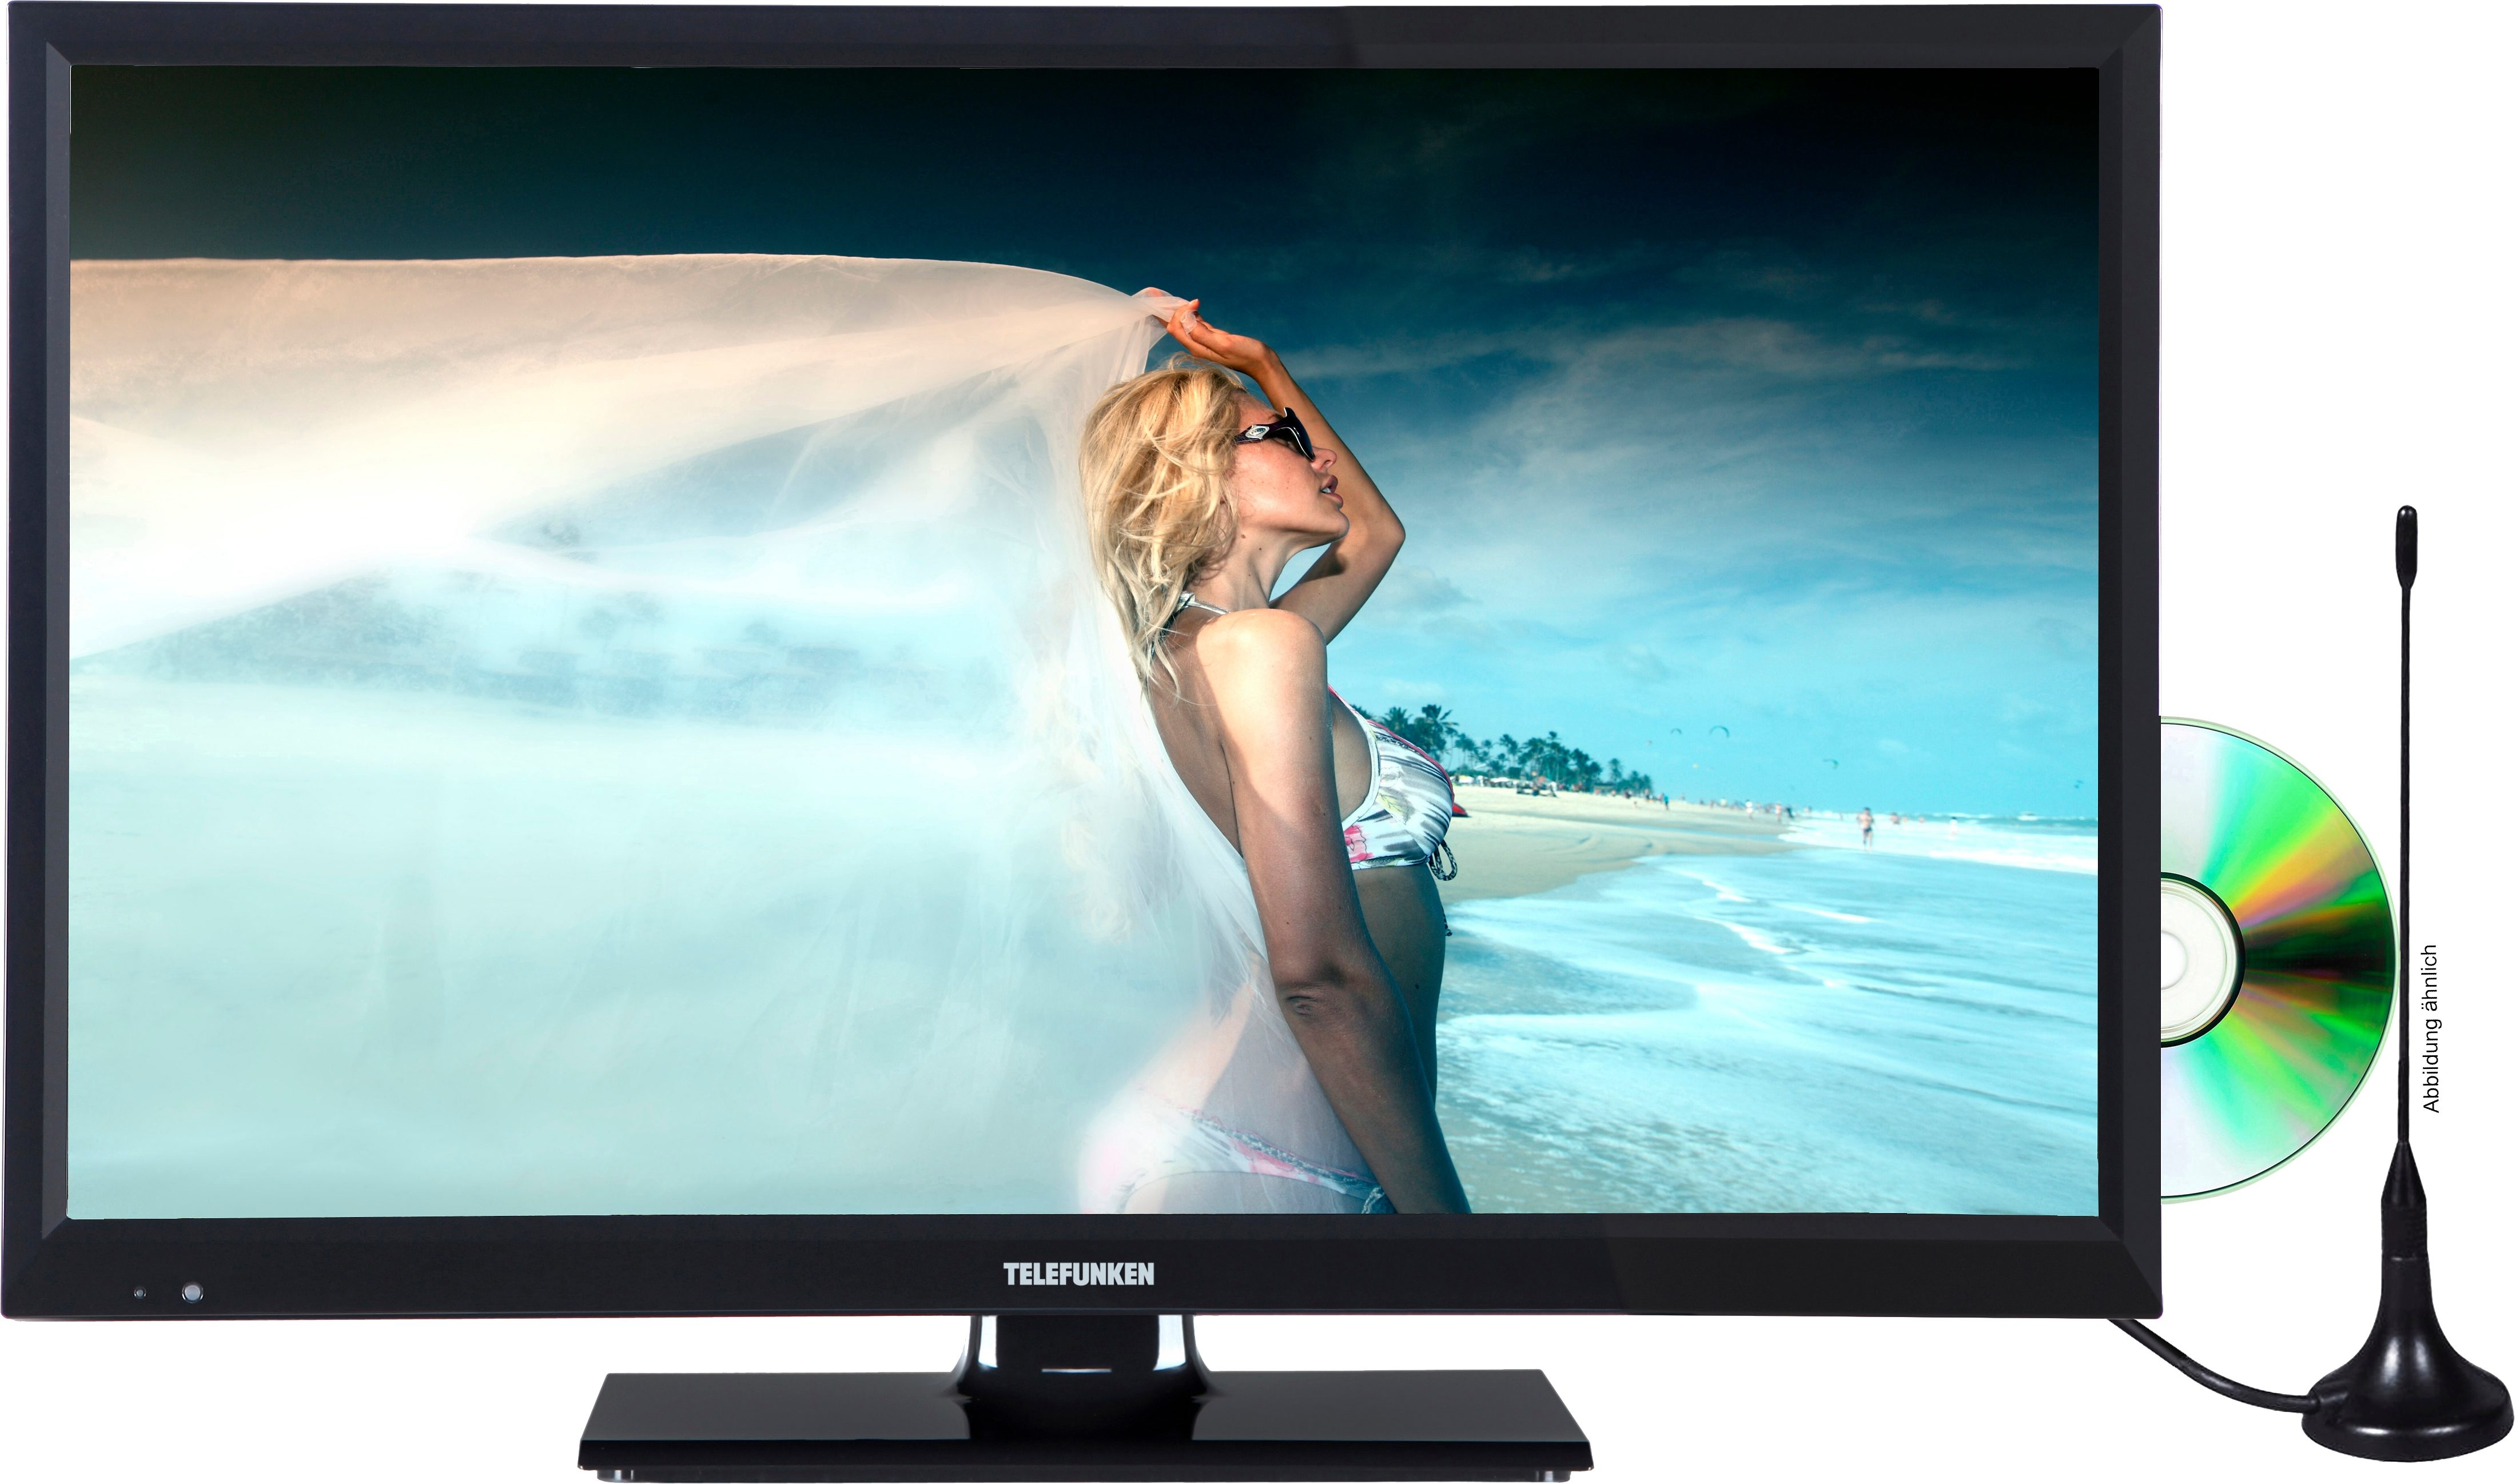 Telefunken L24H180M3D (inkl. DVD-Player), LED Fernseher, 61 cm (24 Zoll), HD-ready 720p